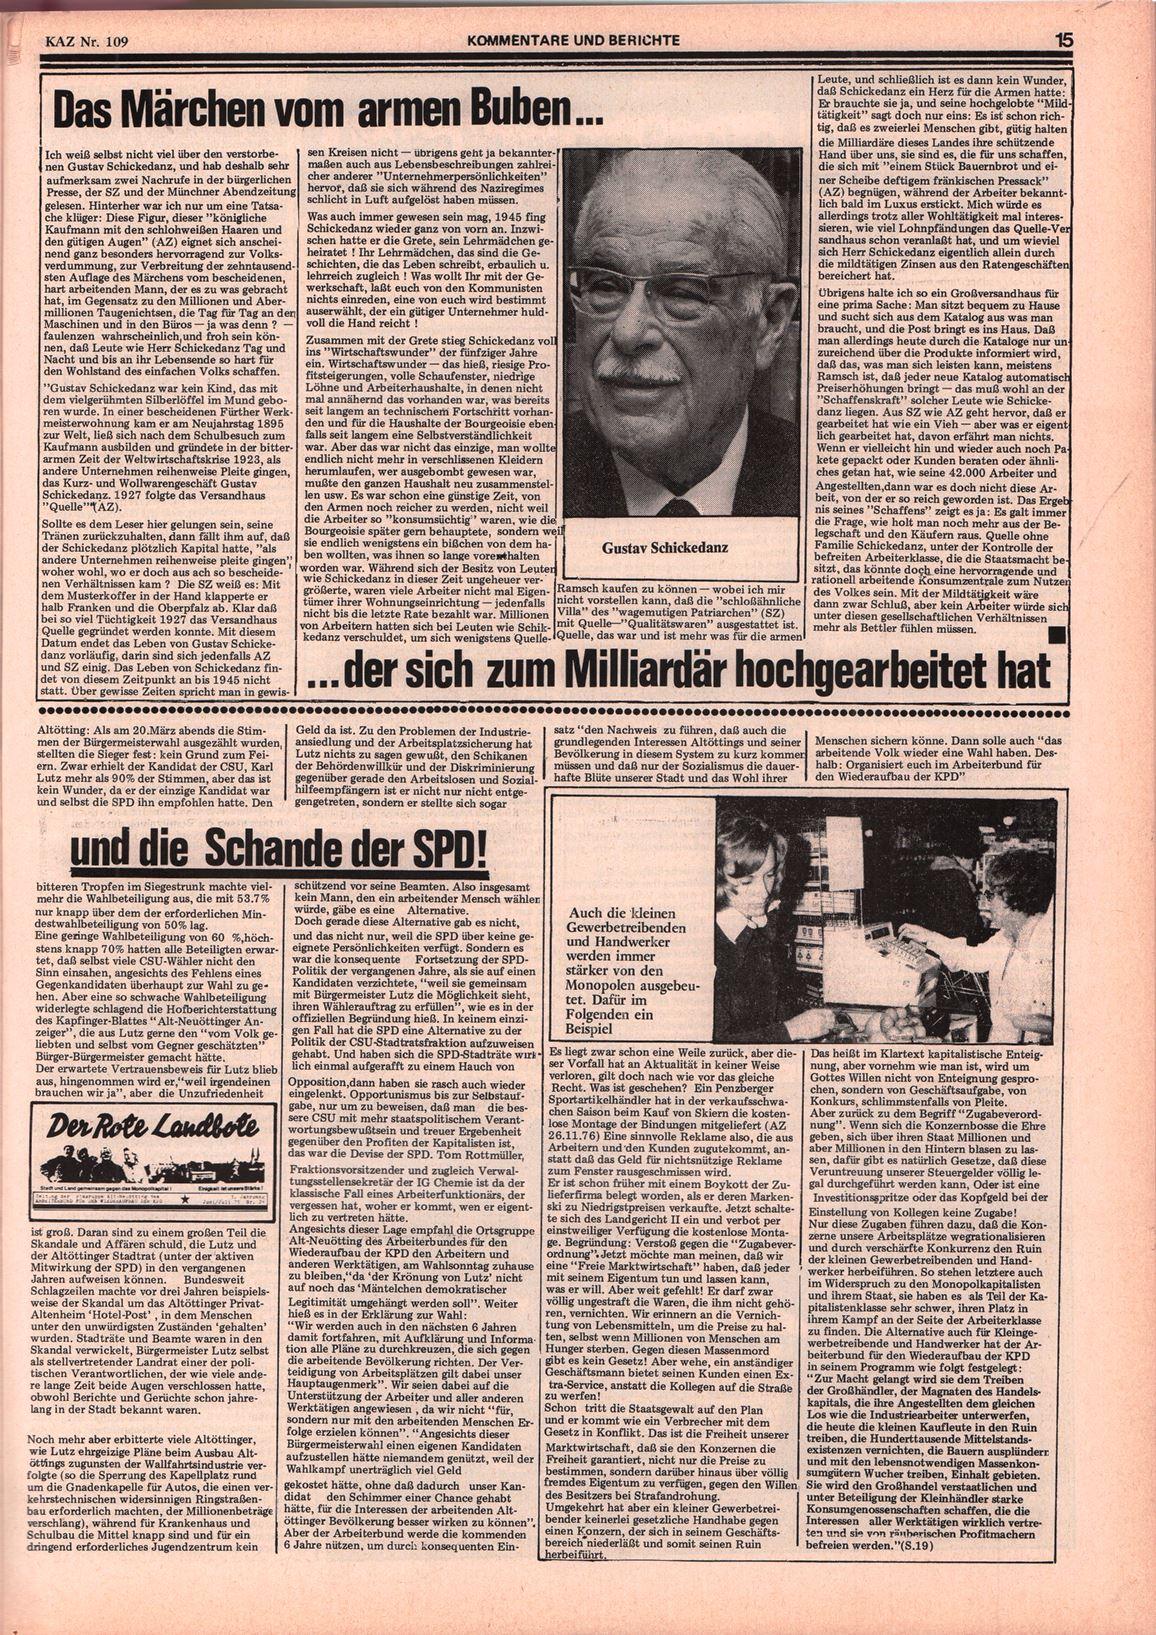 ABG_KAZ_1977_117